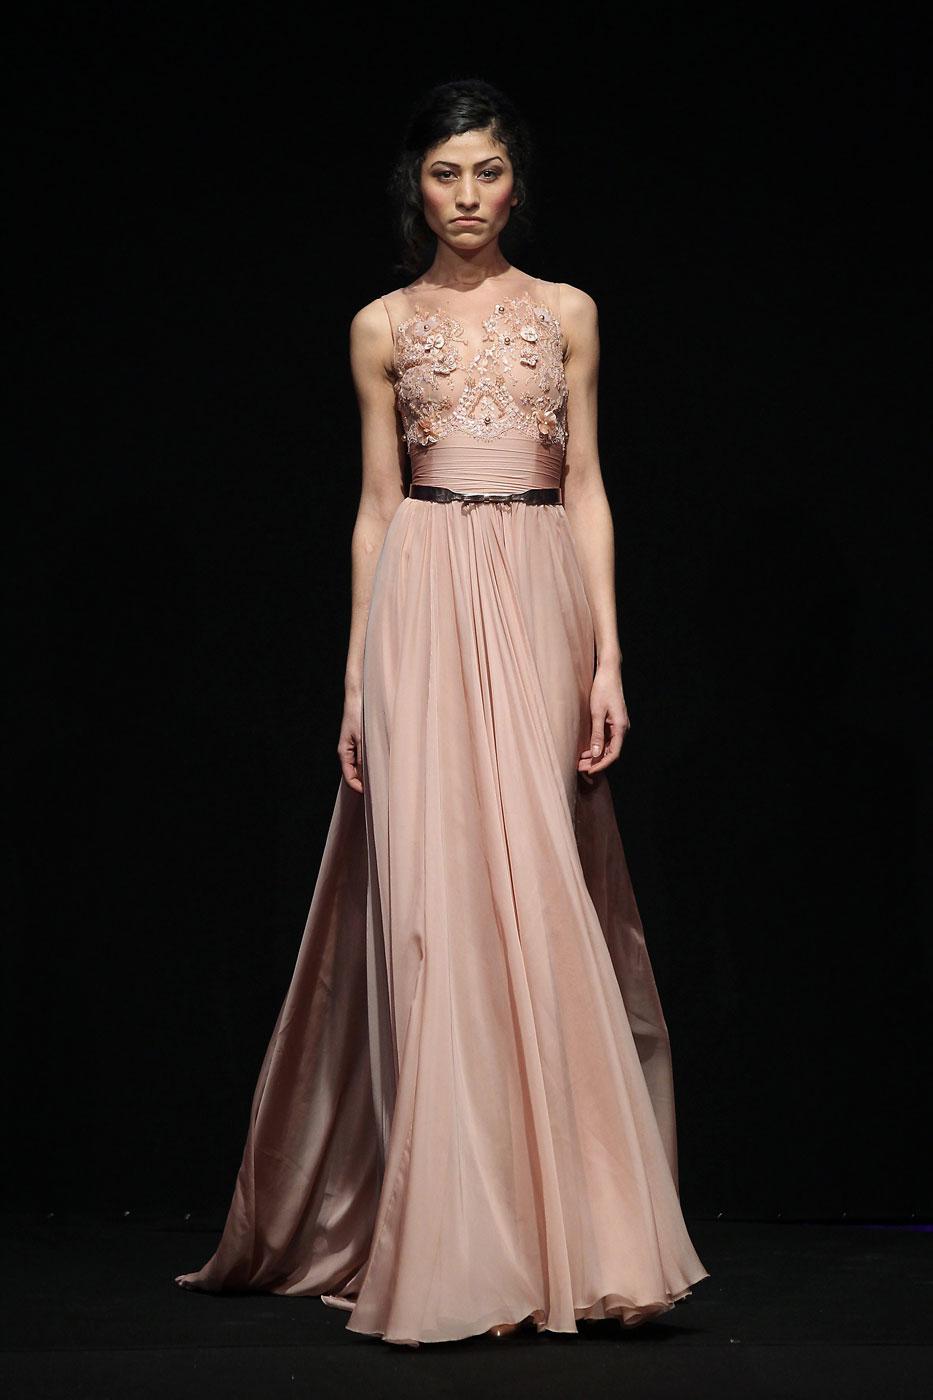 Abed-Mahfouz-fashion-runway-show-haute-couture-paris-spring-2015-the-impression-17